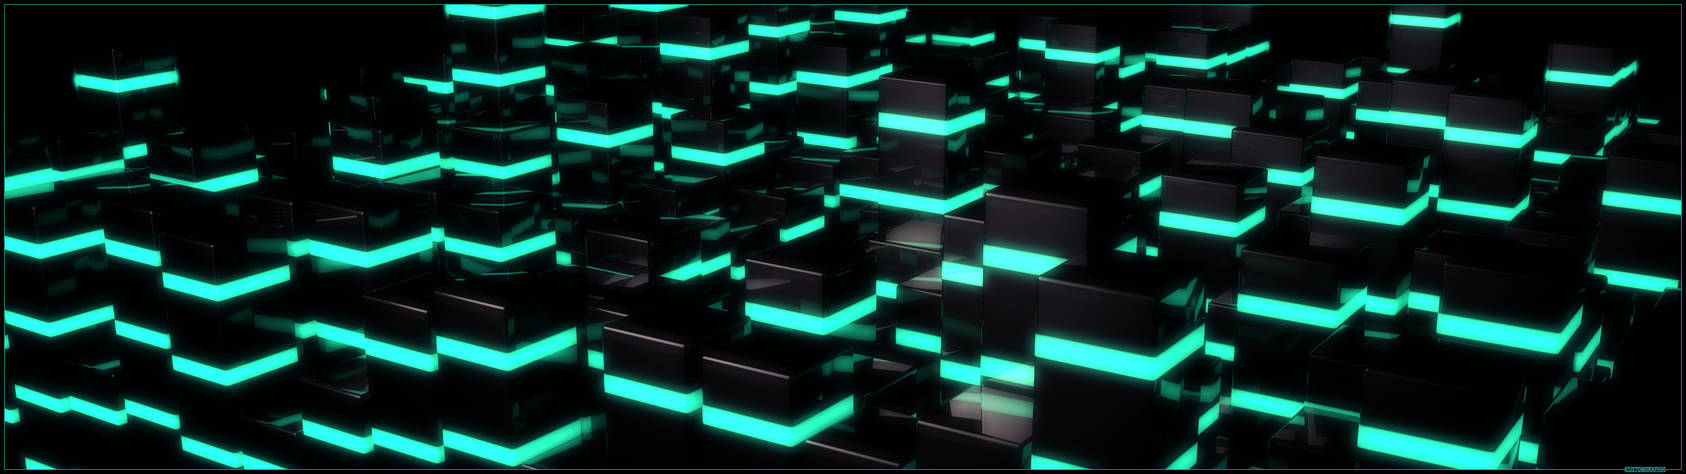 Abstract C4D Dualscreen wallpaper (3840x1080)